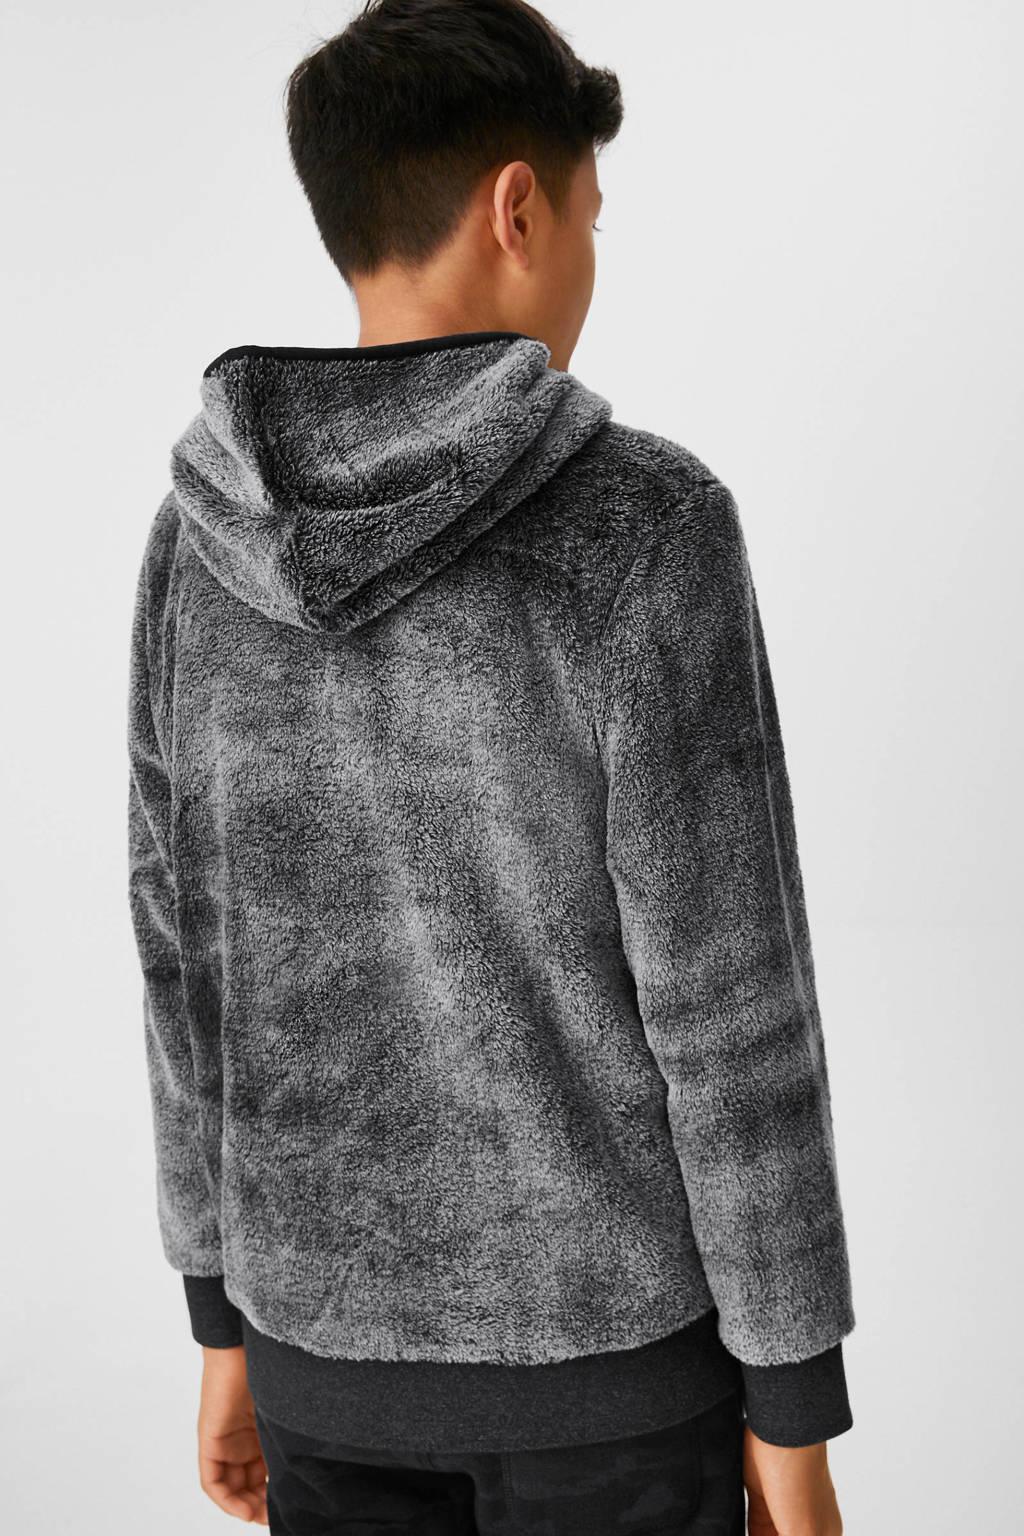 C&A Here & There hoodie met tekst antraciet, Antraciet